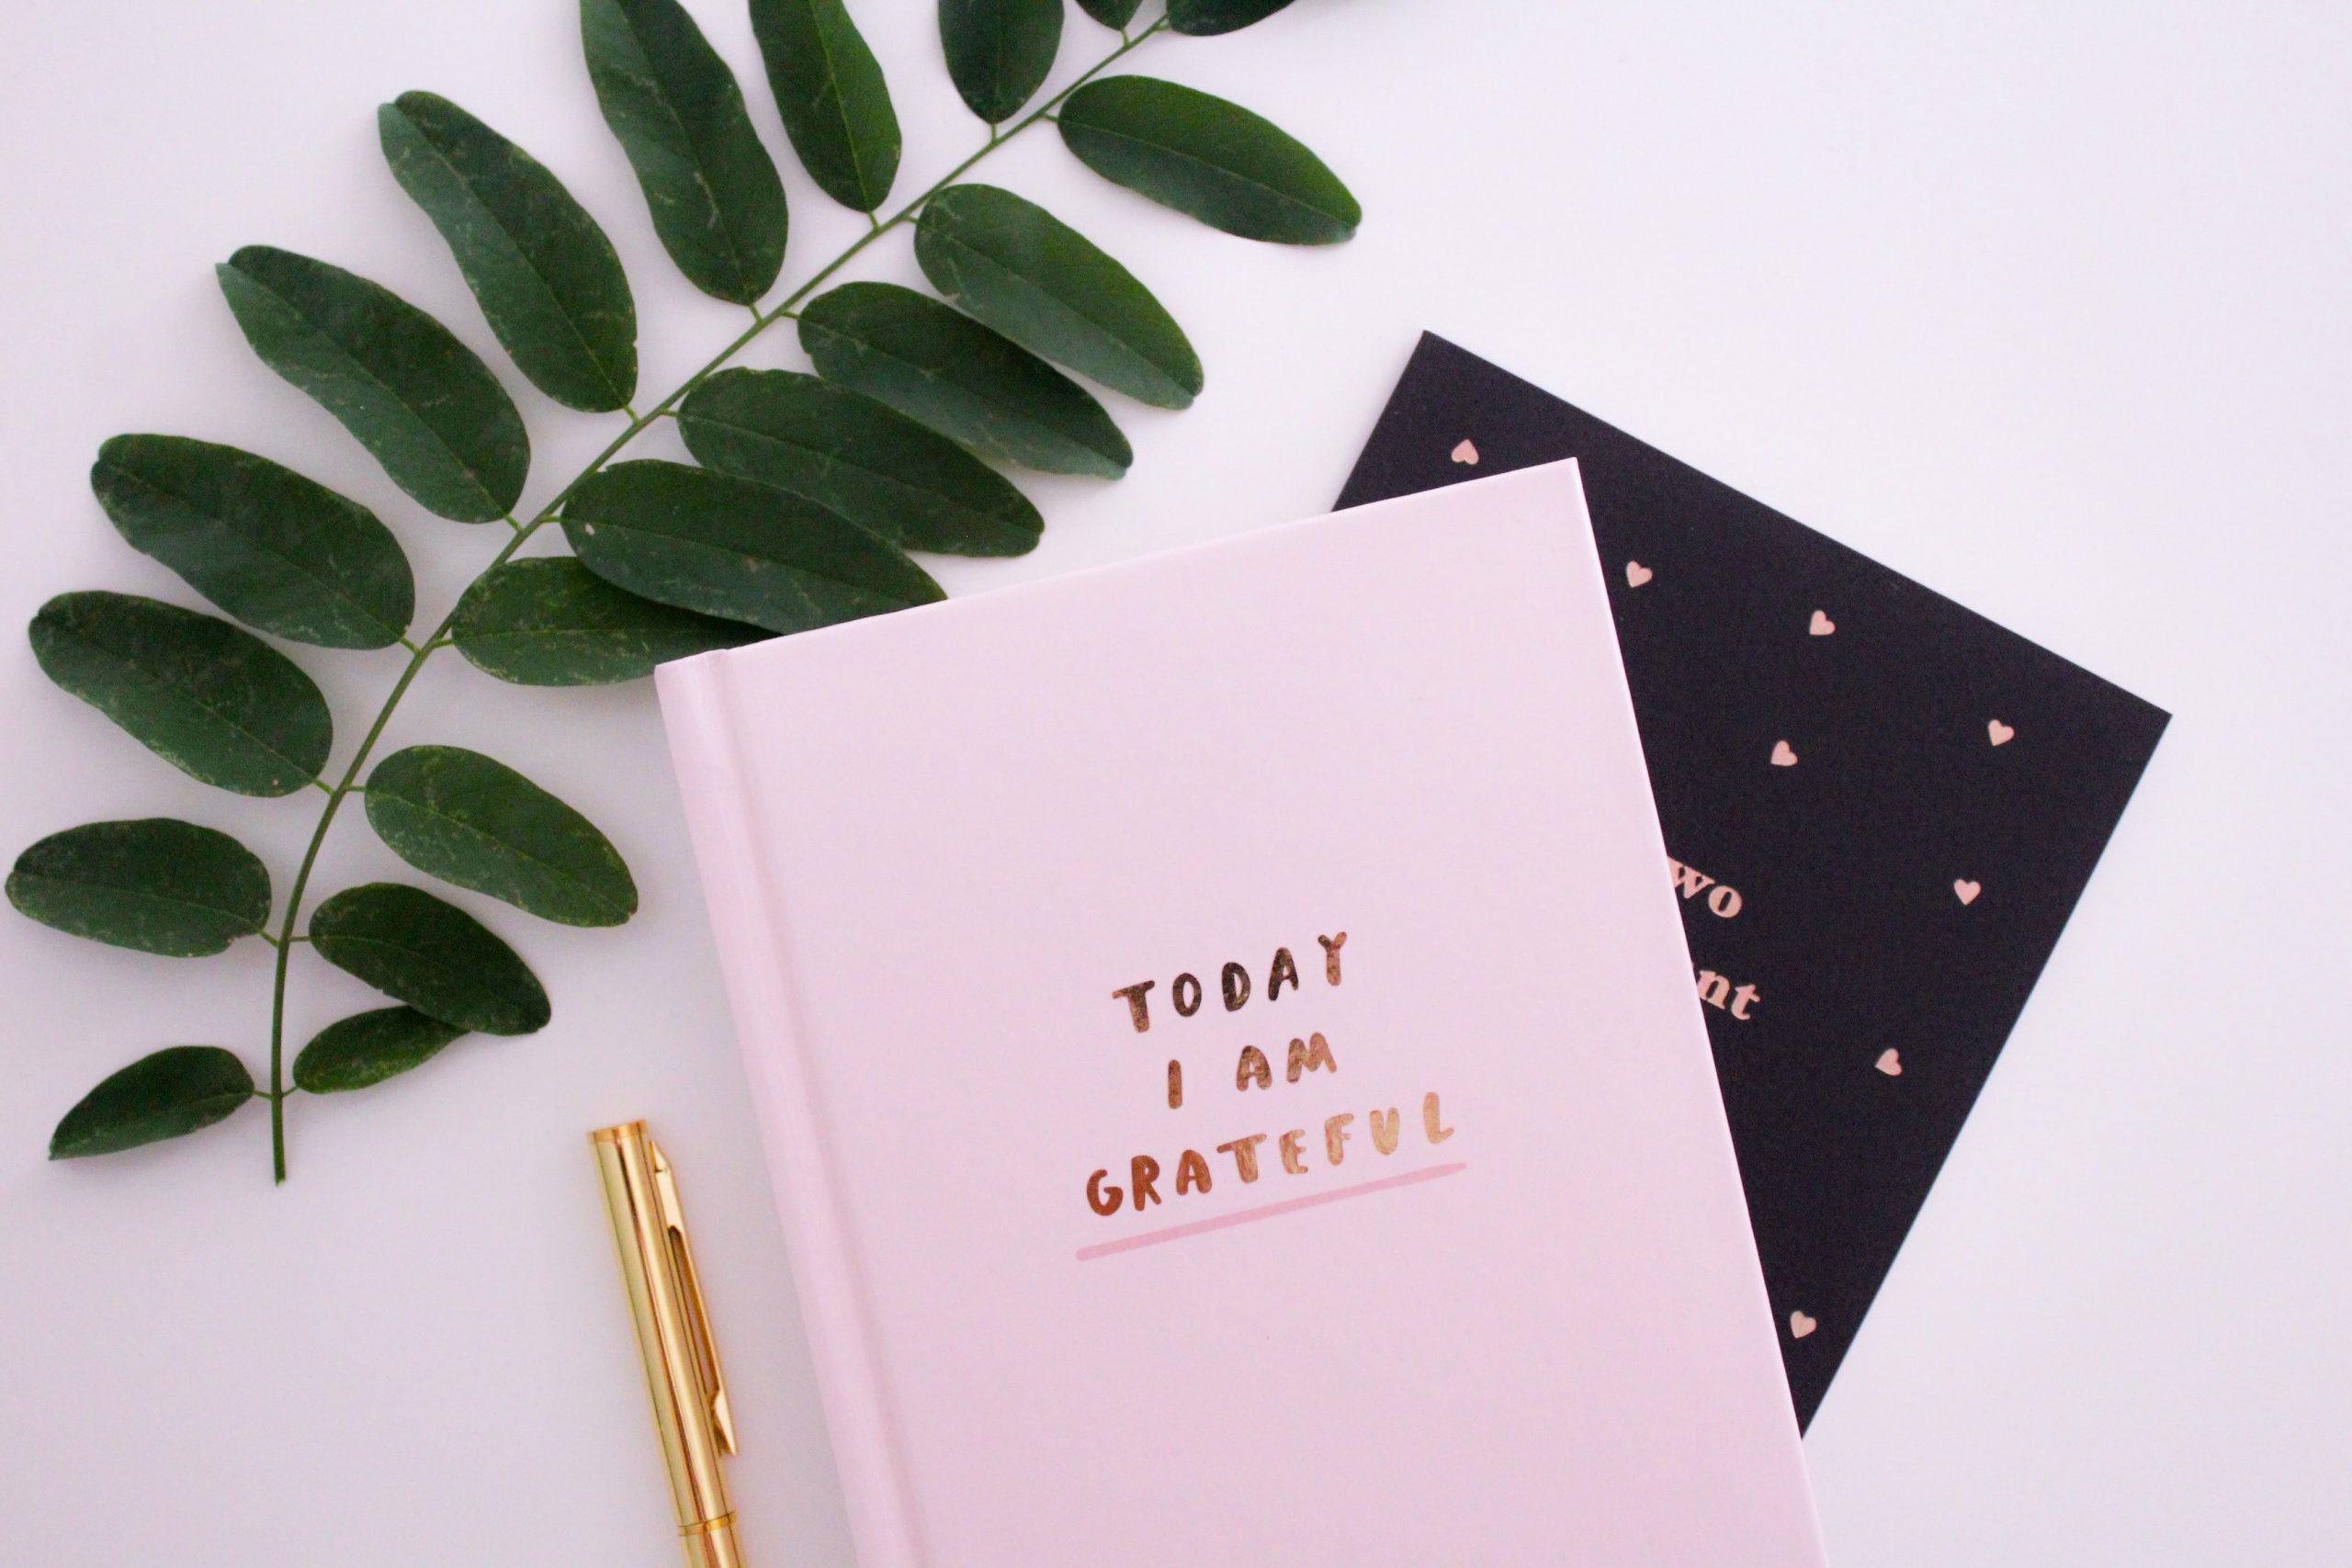 Tagebuch mit Pflanze & Stift